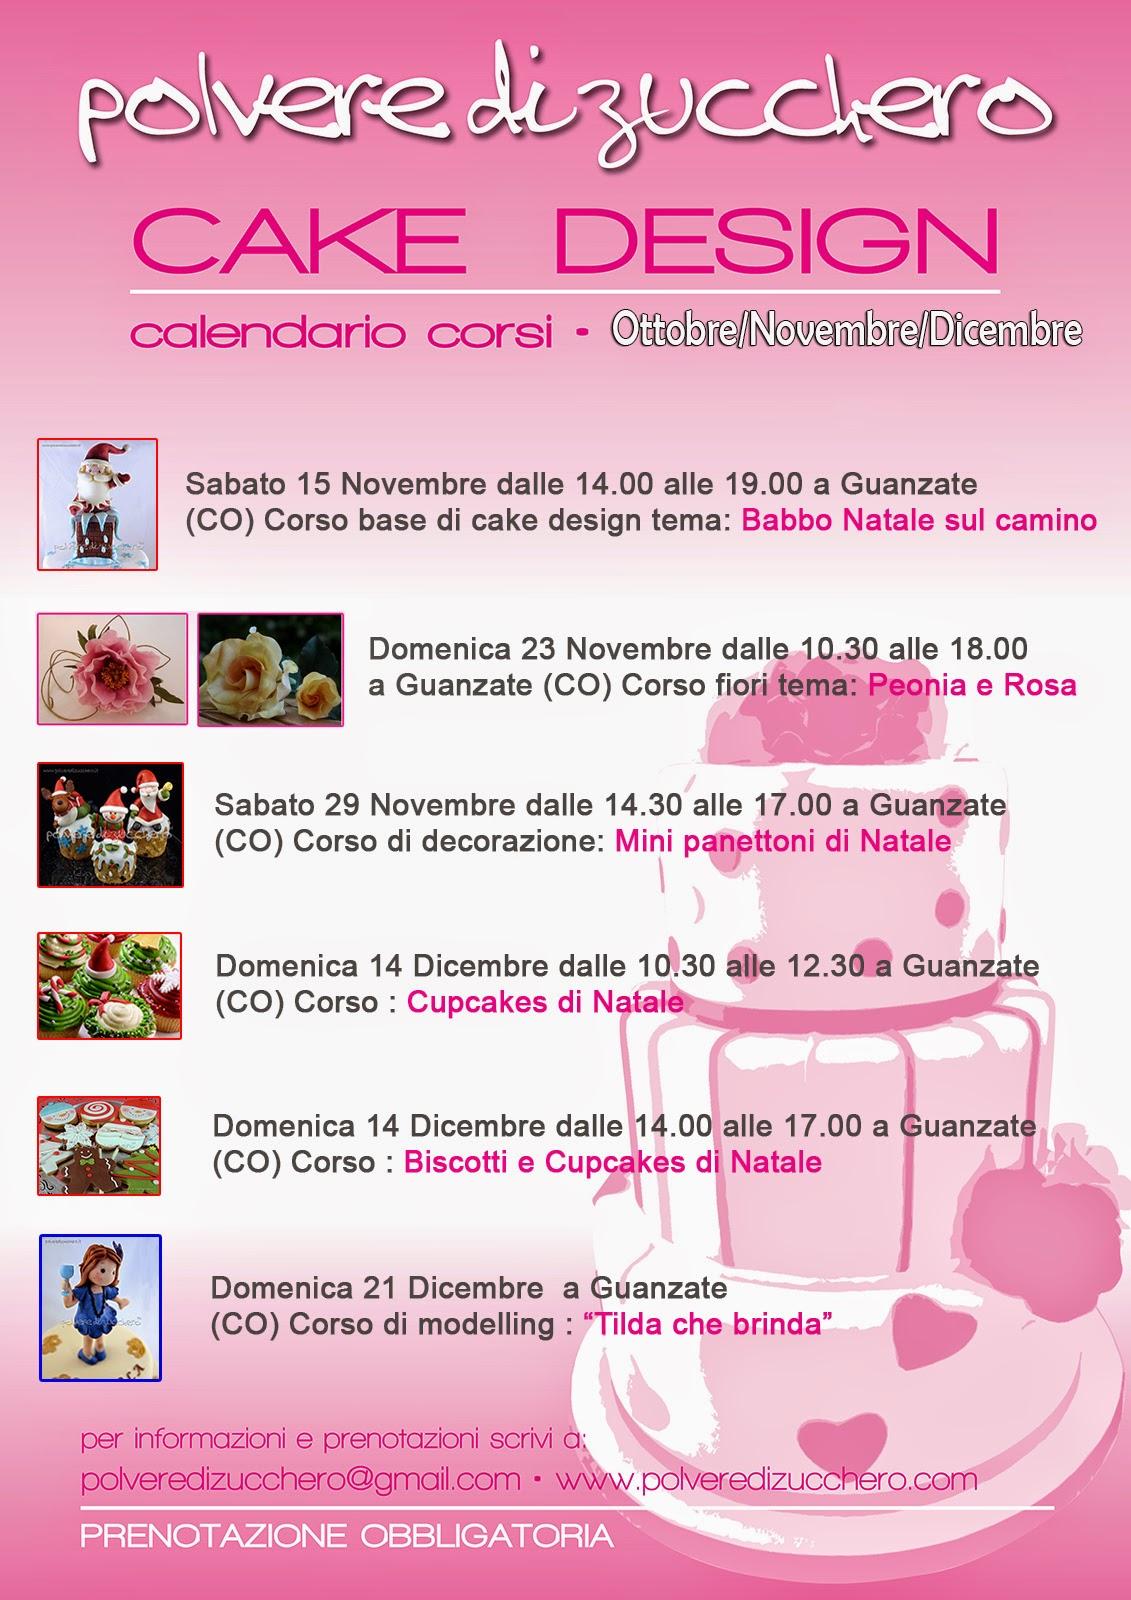 corsi di cake design a guanzate (co): torte, biscotti, fiori in pasta di zucchero e panettoni decorati